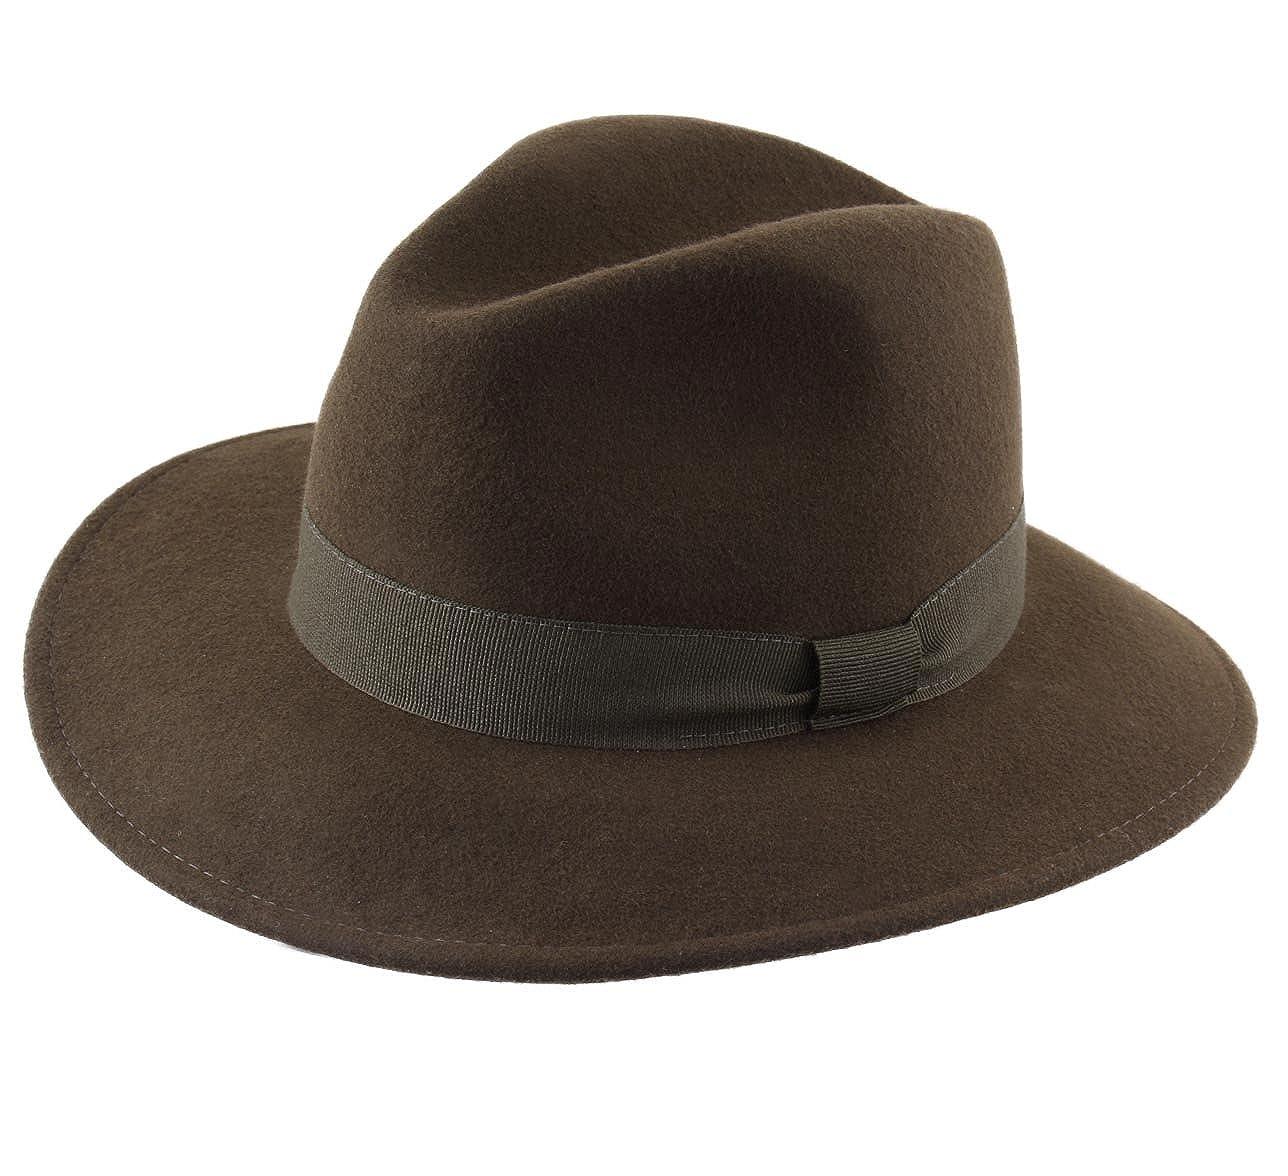 Modissima Traveller Cavalier Wool Felt Fedora Hat